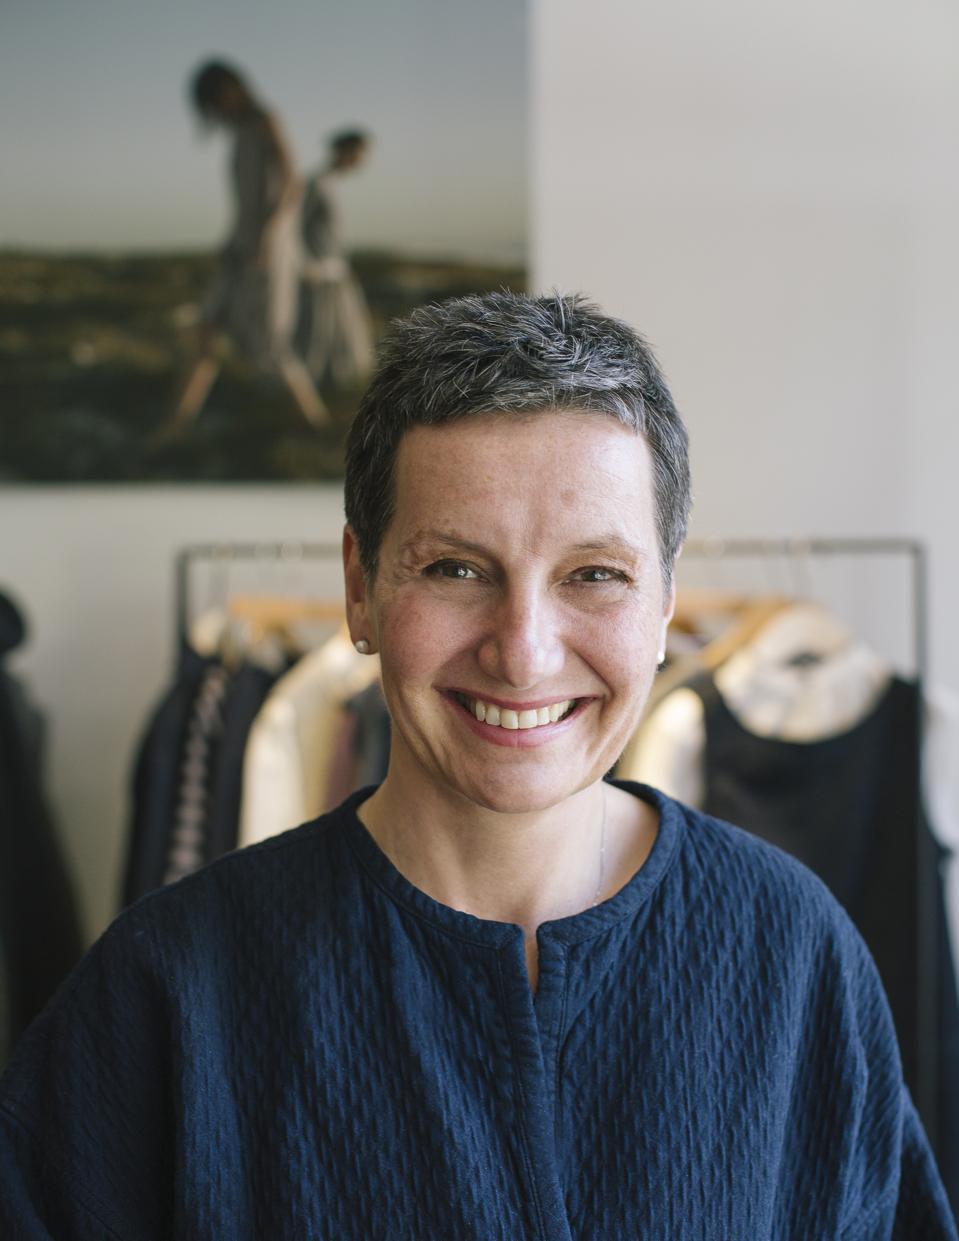 Suzie de Rohan Willner, CEO of Toast